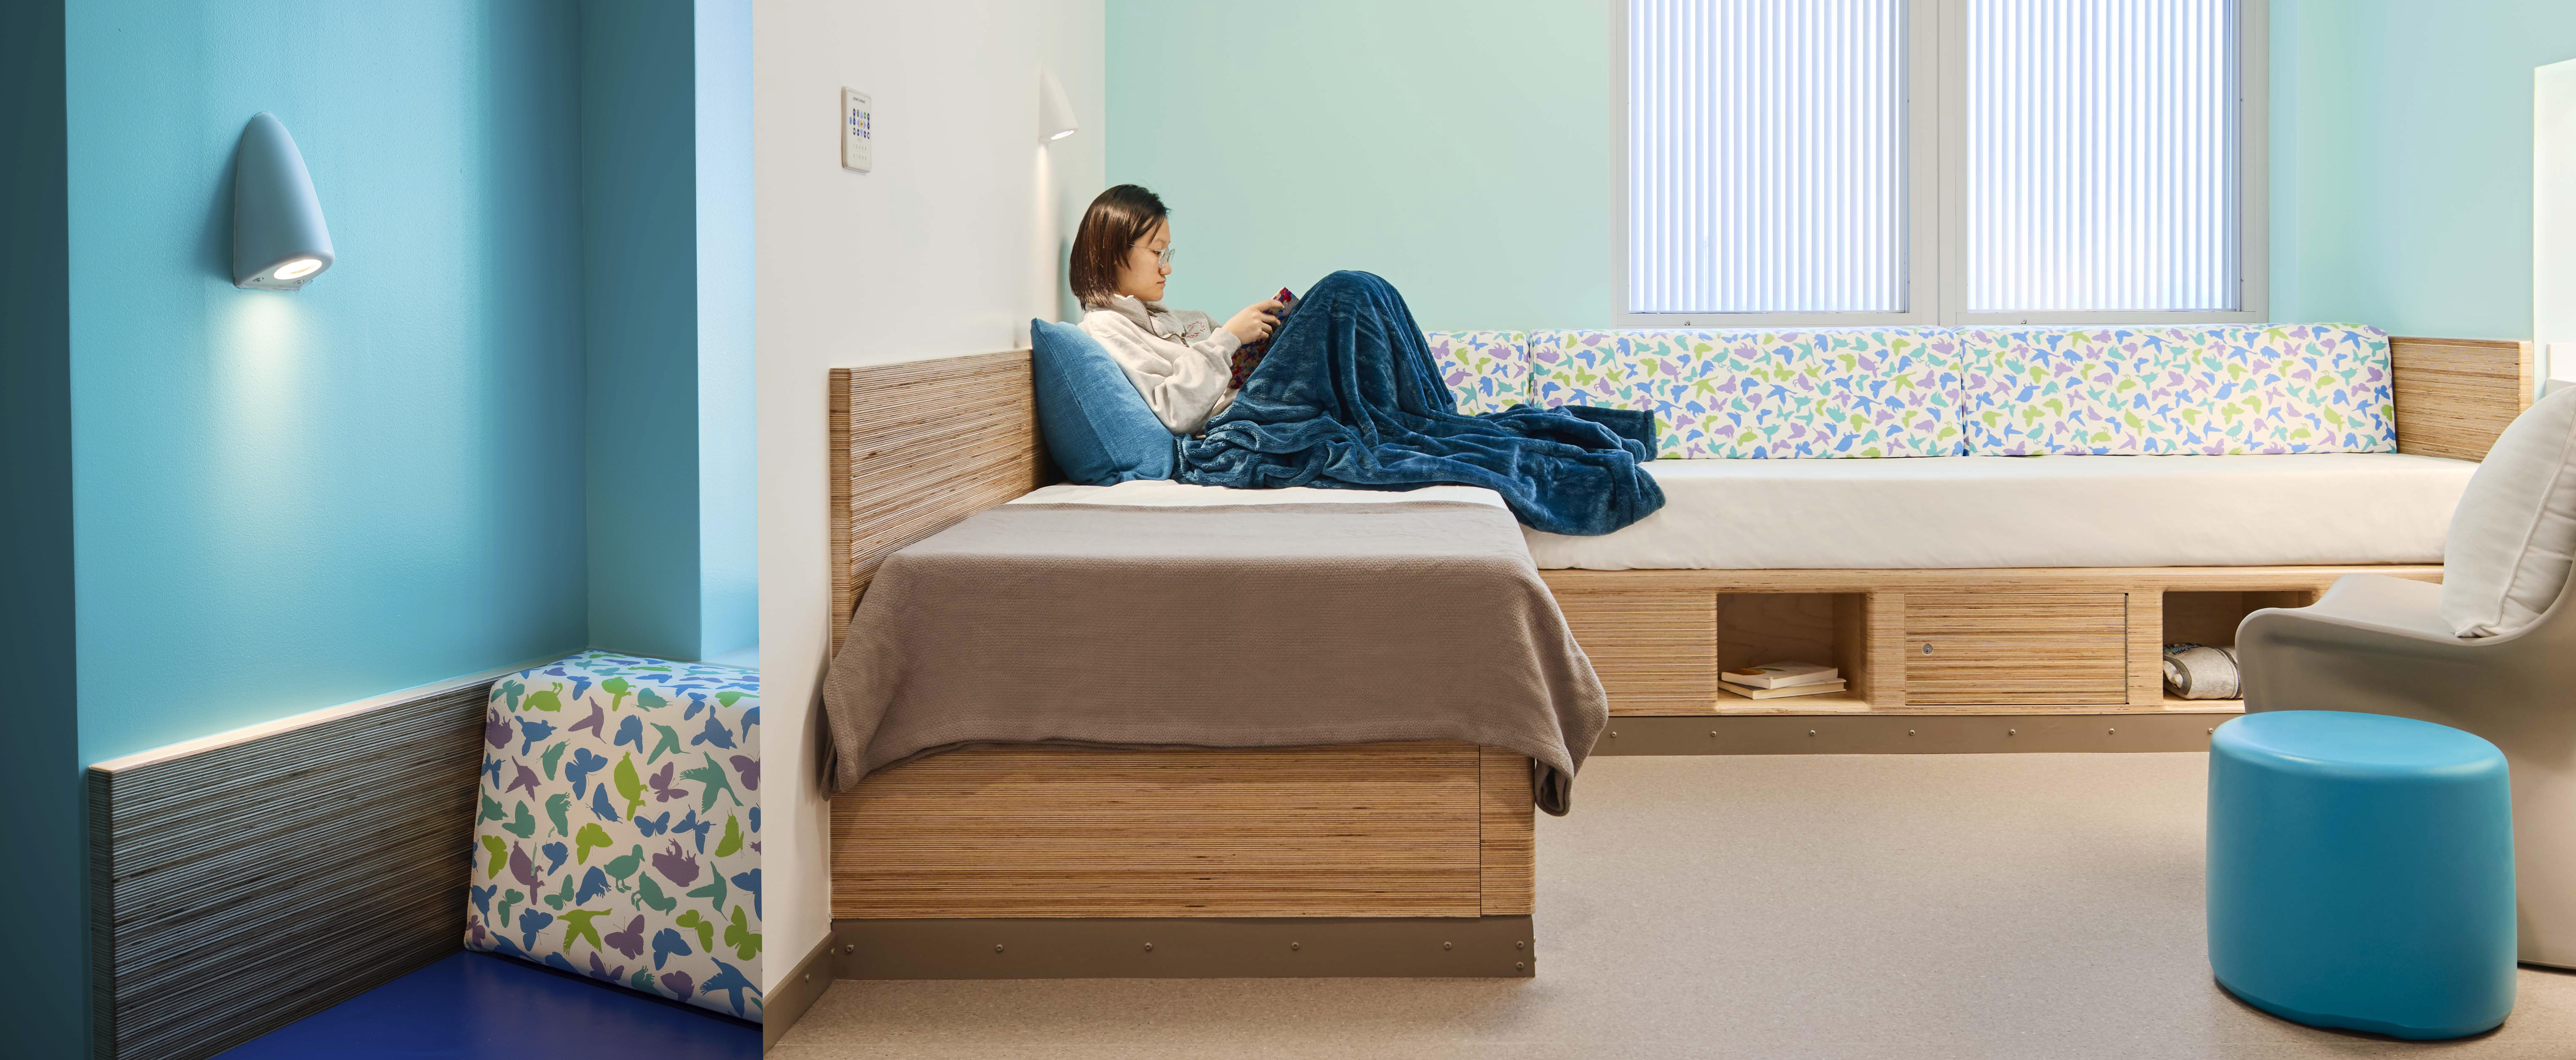 Gig behavioral health anti ligature wall sconce